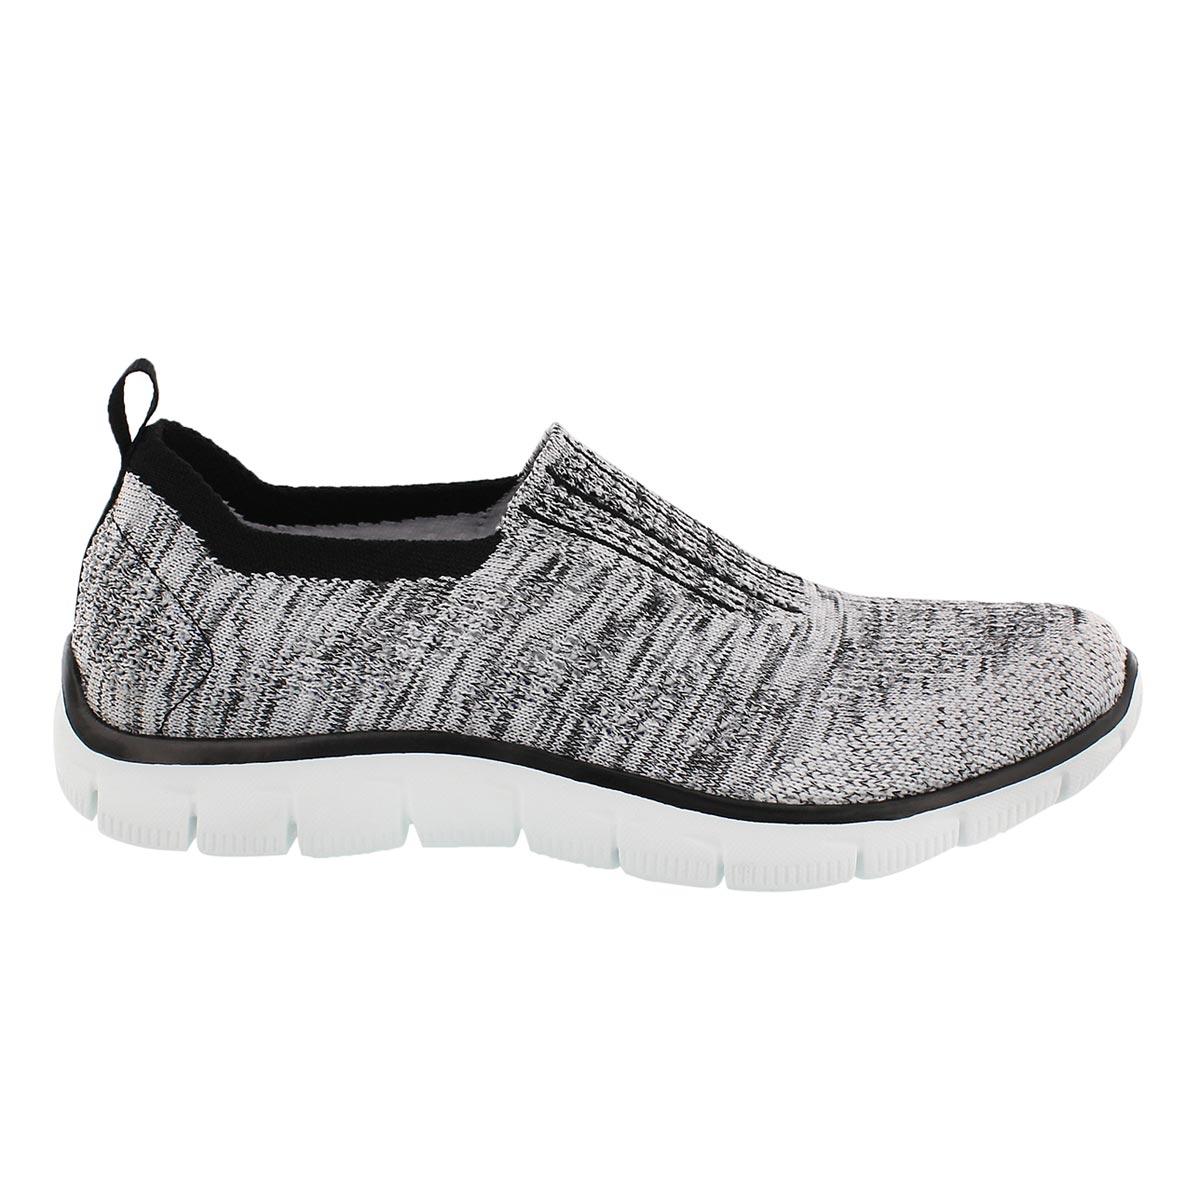 Lds Empire InsideLook blk/wt slipon shoe